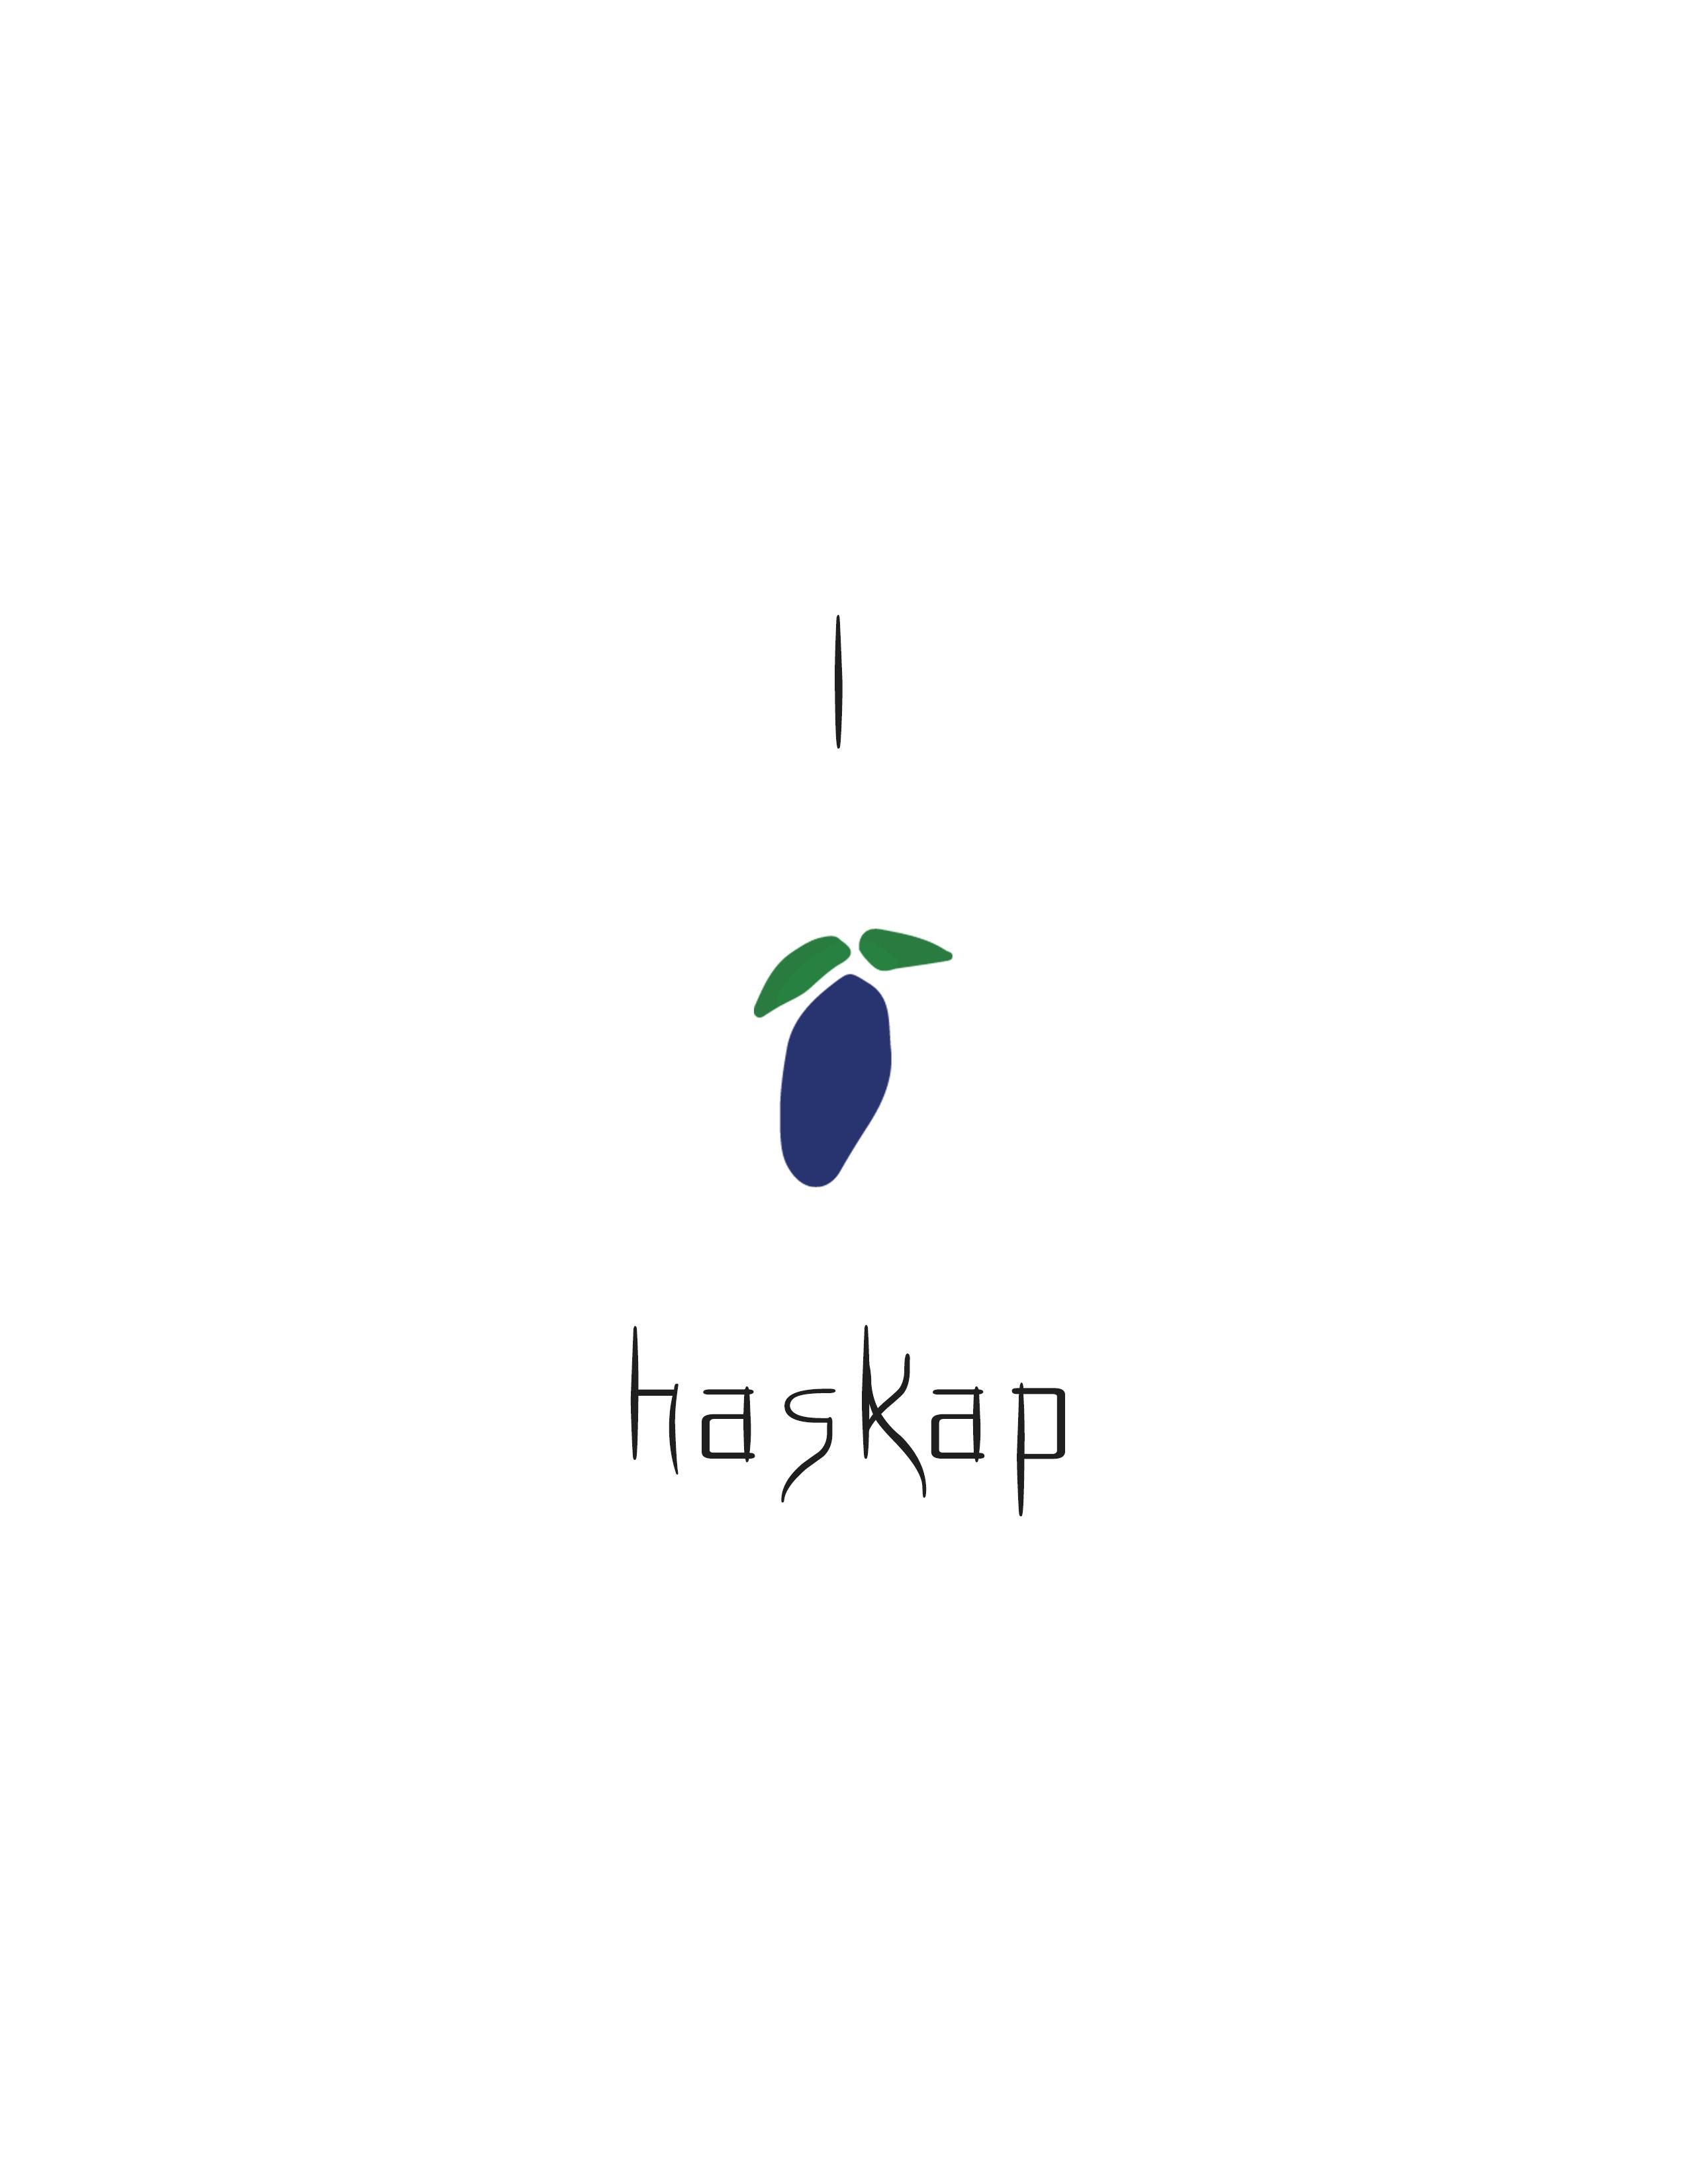 I love haskap